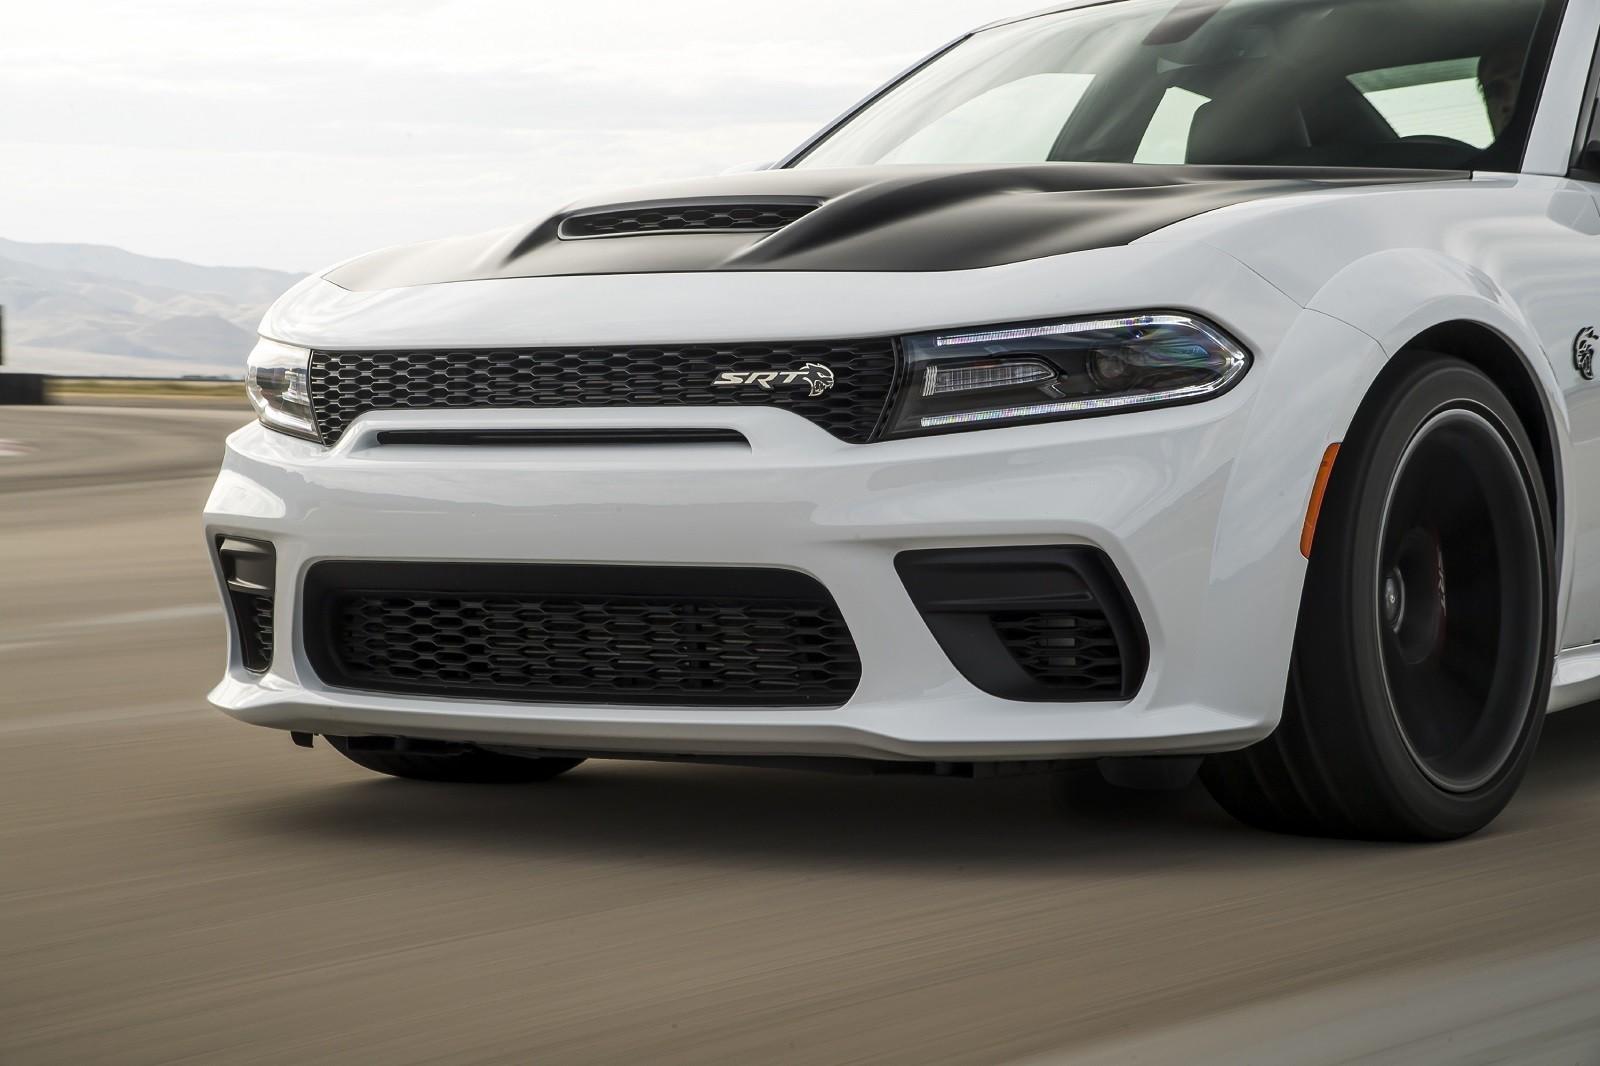 Foto de Dodge Charger SRT Hellcat Redeye 2021 (45/49)